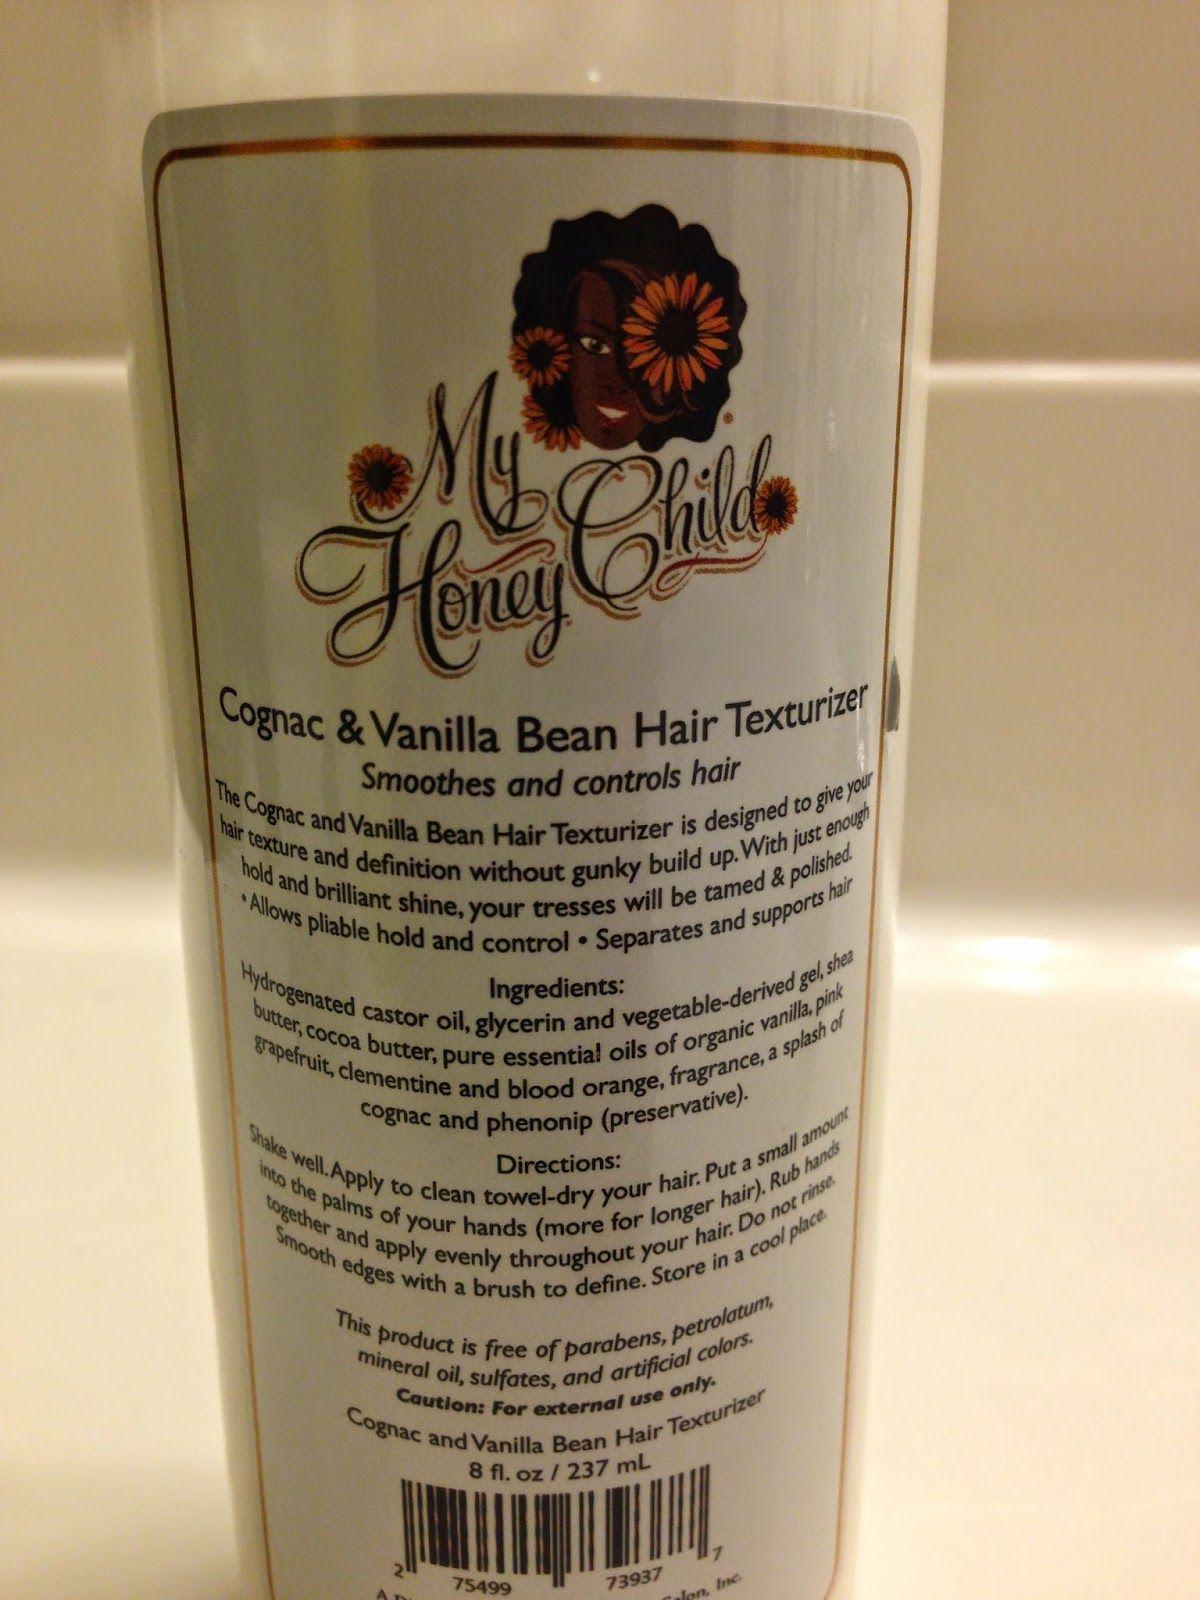 The Cognac u Vanilla Bean Texturizer by My Honey Child provides a